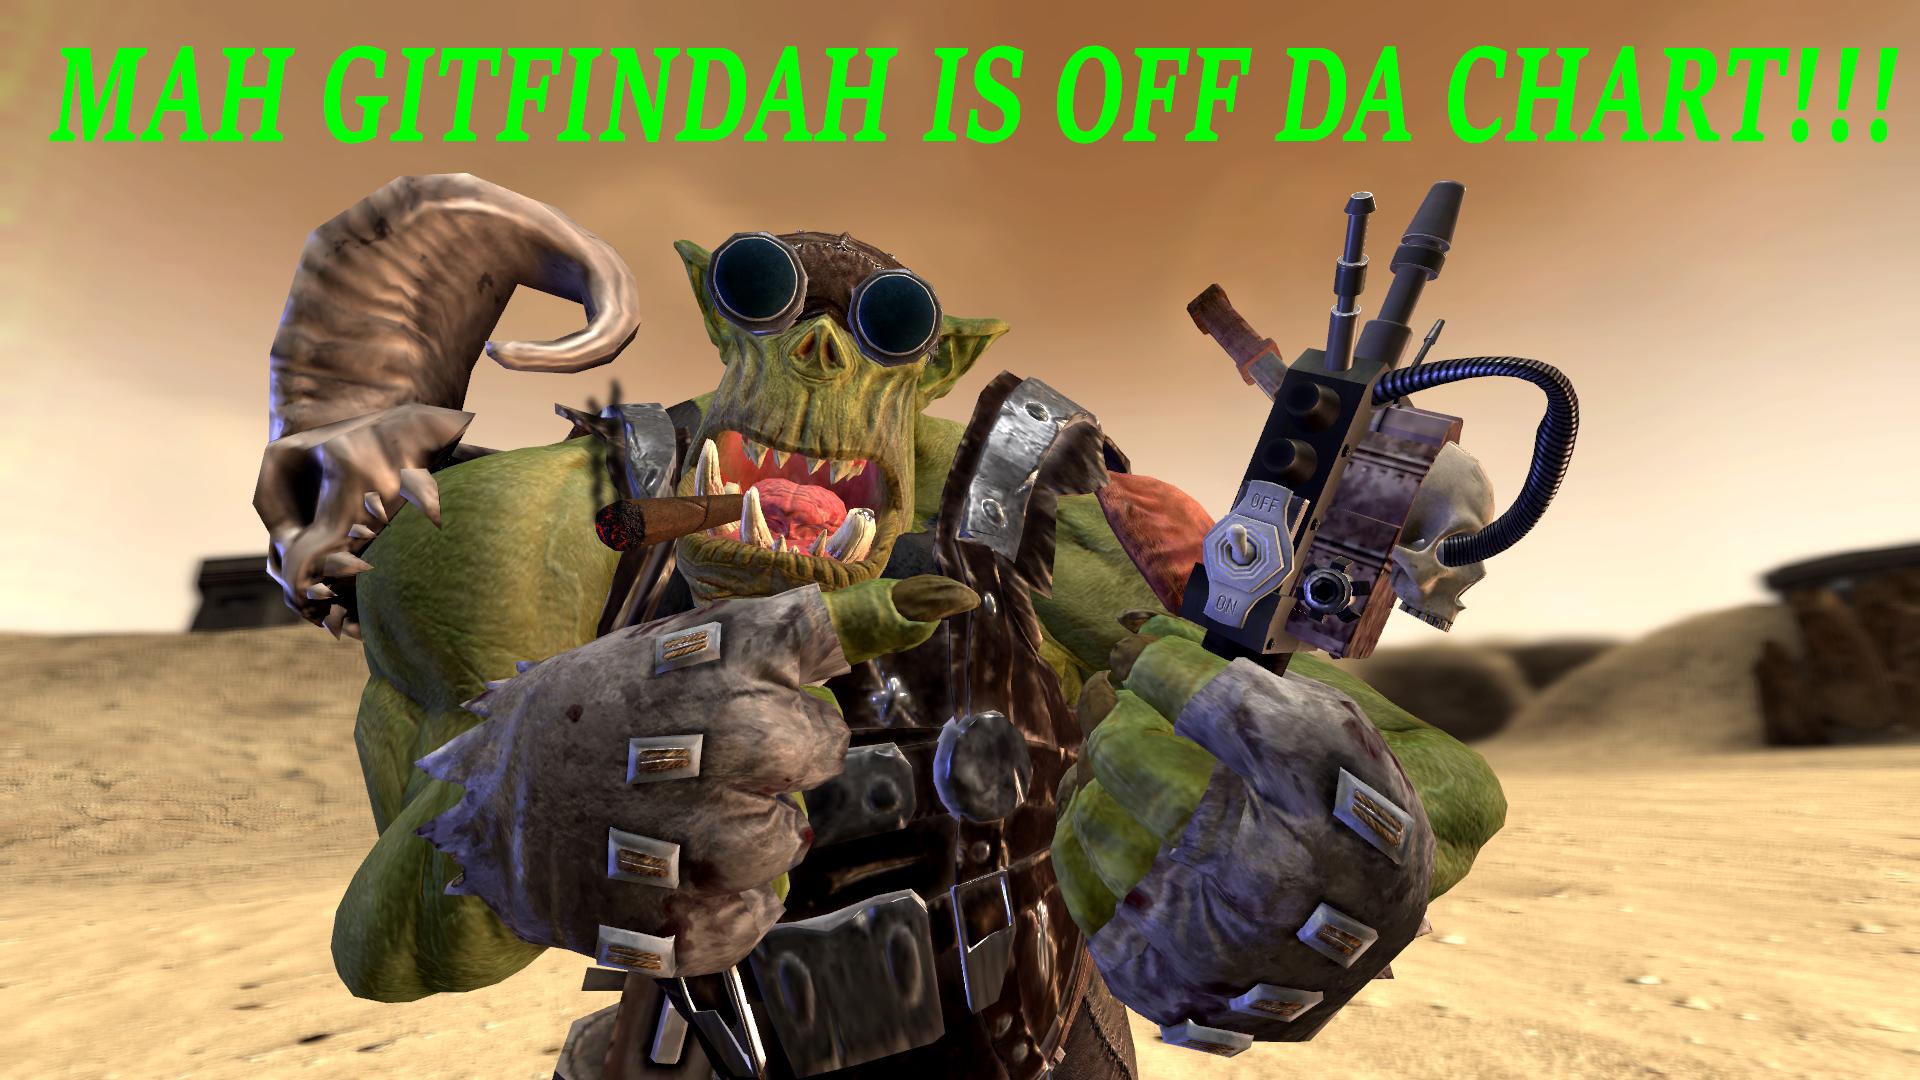 Warhammer 40K meme: Gitfandah by commanderjonas on DeviantArt